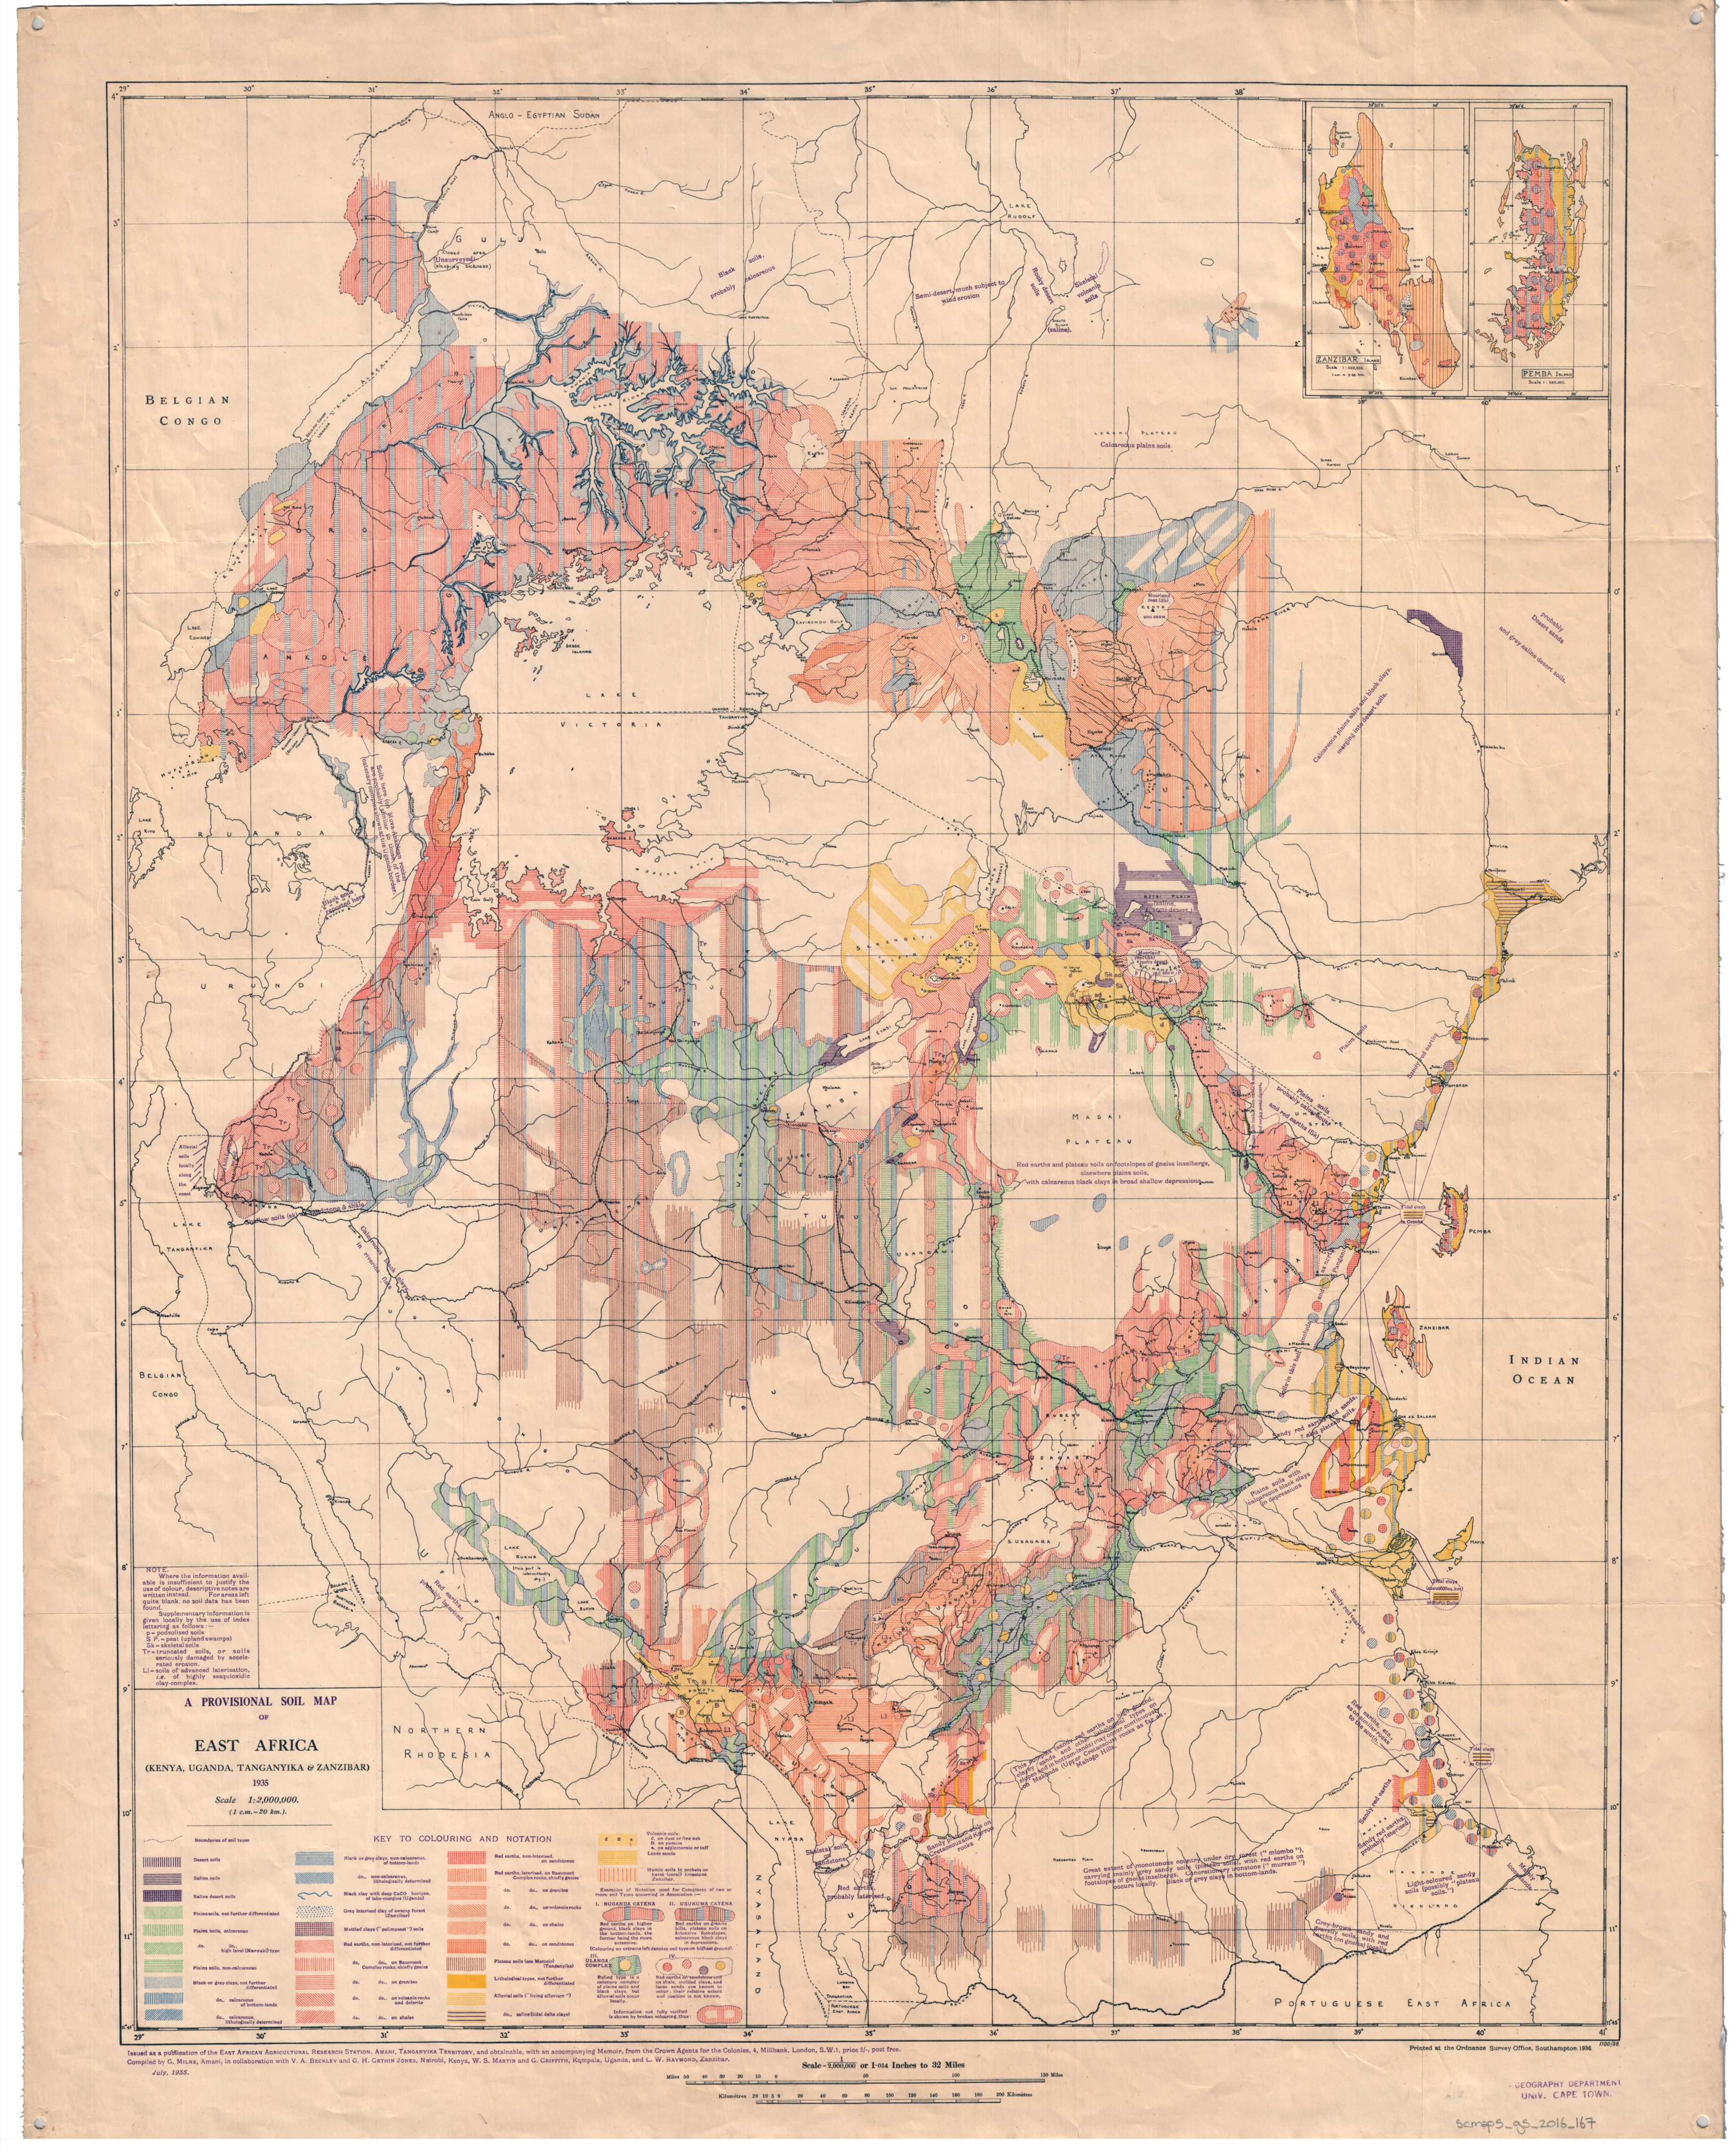 A provisional soil map of East Africa Kenya Uganda Tanganyika